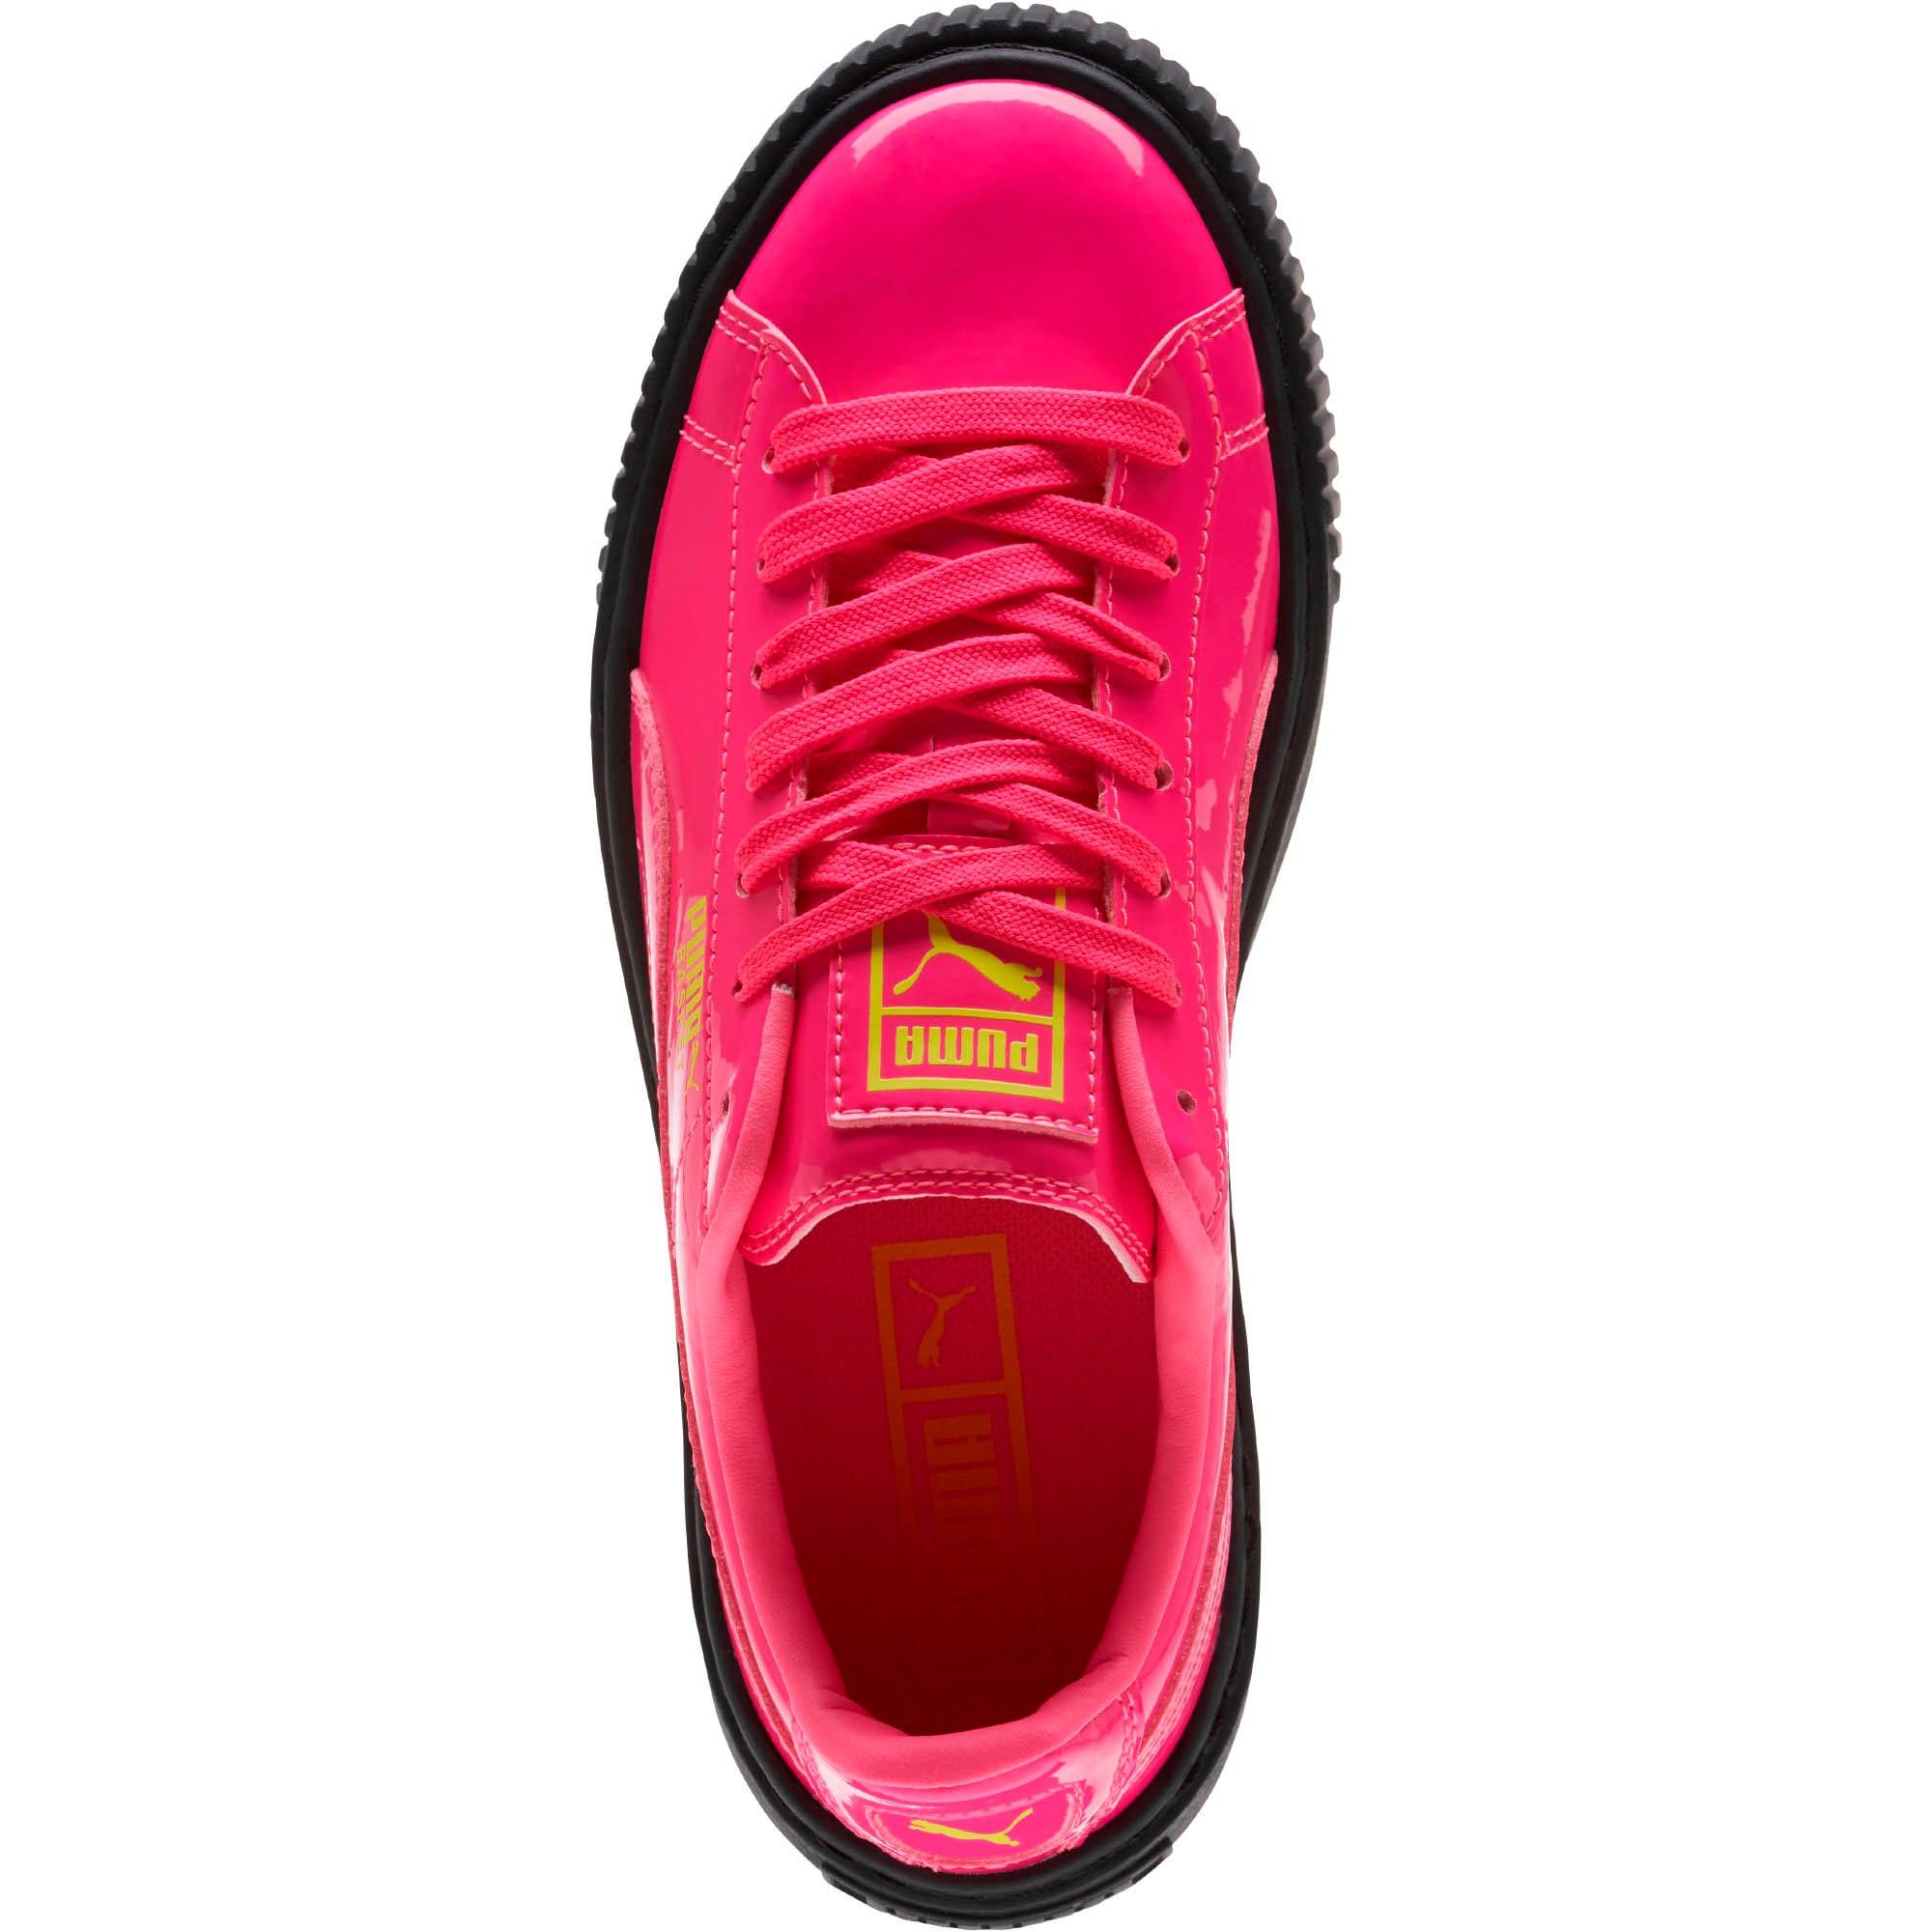 Thumbnail 5 of Basket Platform Block JR  Sneakers, PINK-Sulphur Spr-Black, medium